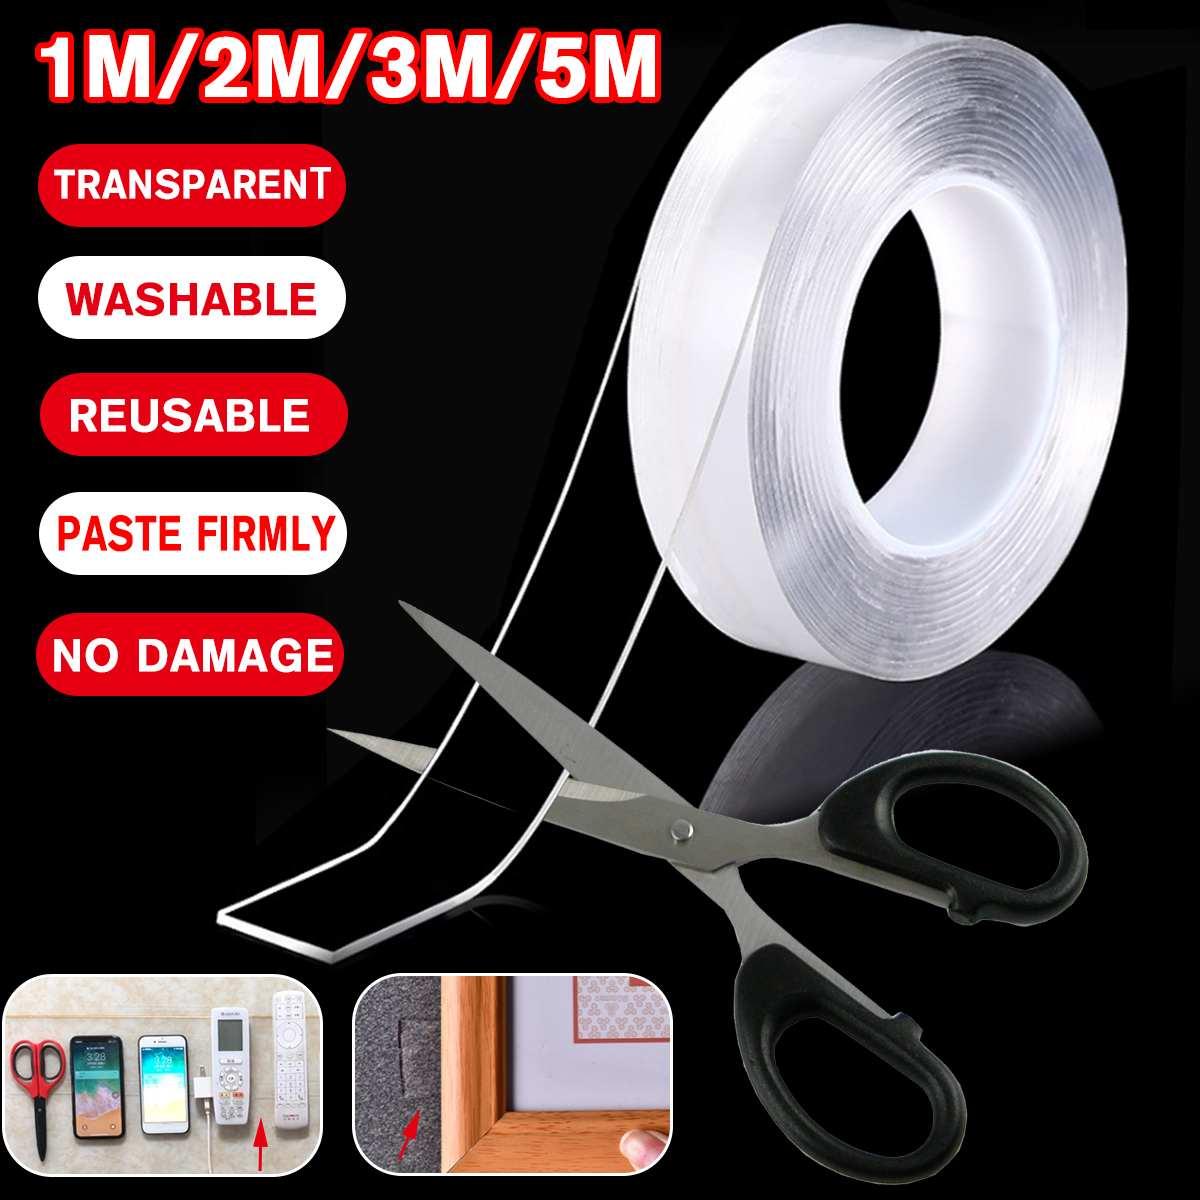 Nueva longitud de doble cara 1 M/2 M/3 M/5 M de ancho 30mm transparente cinta adhesiva transparente grosor 1mm/2mm